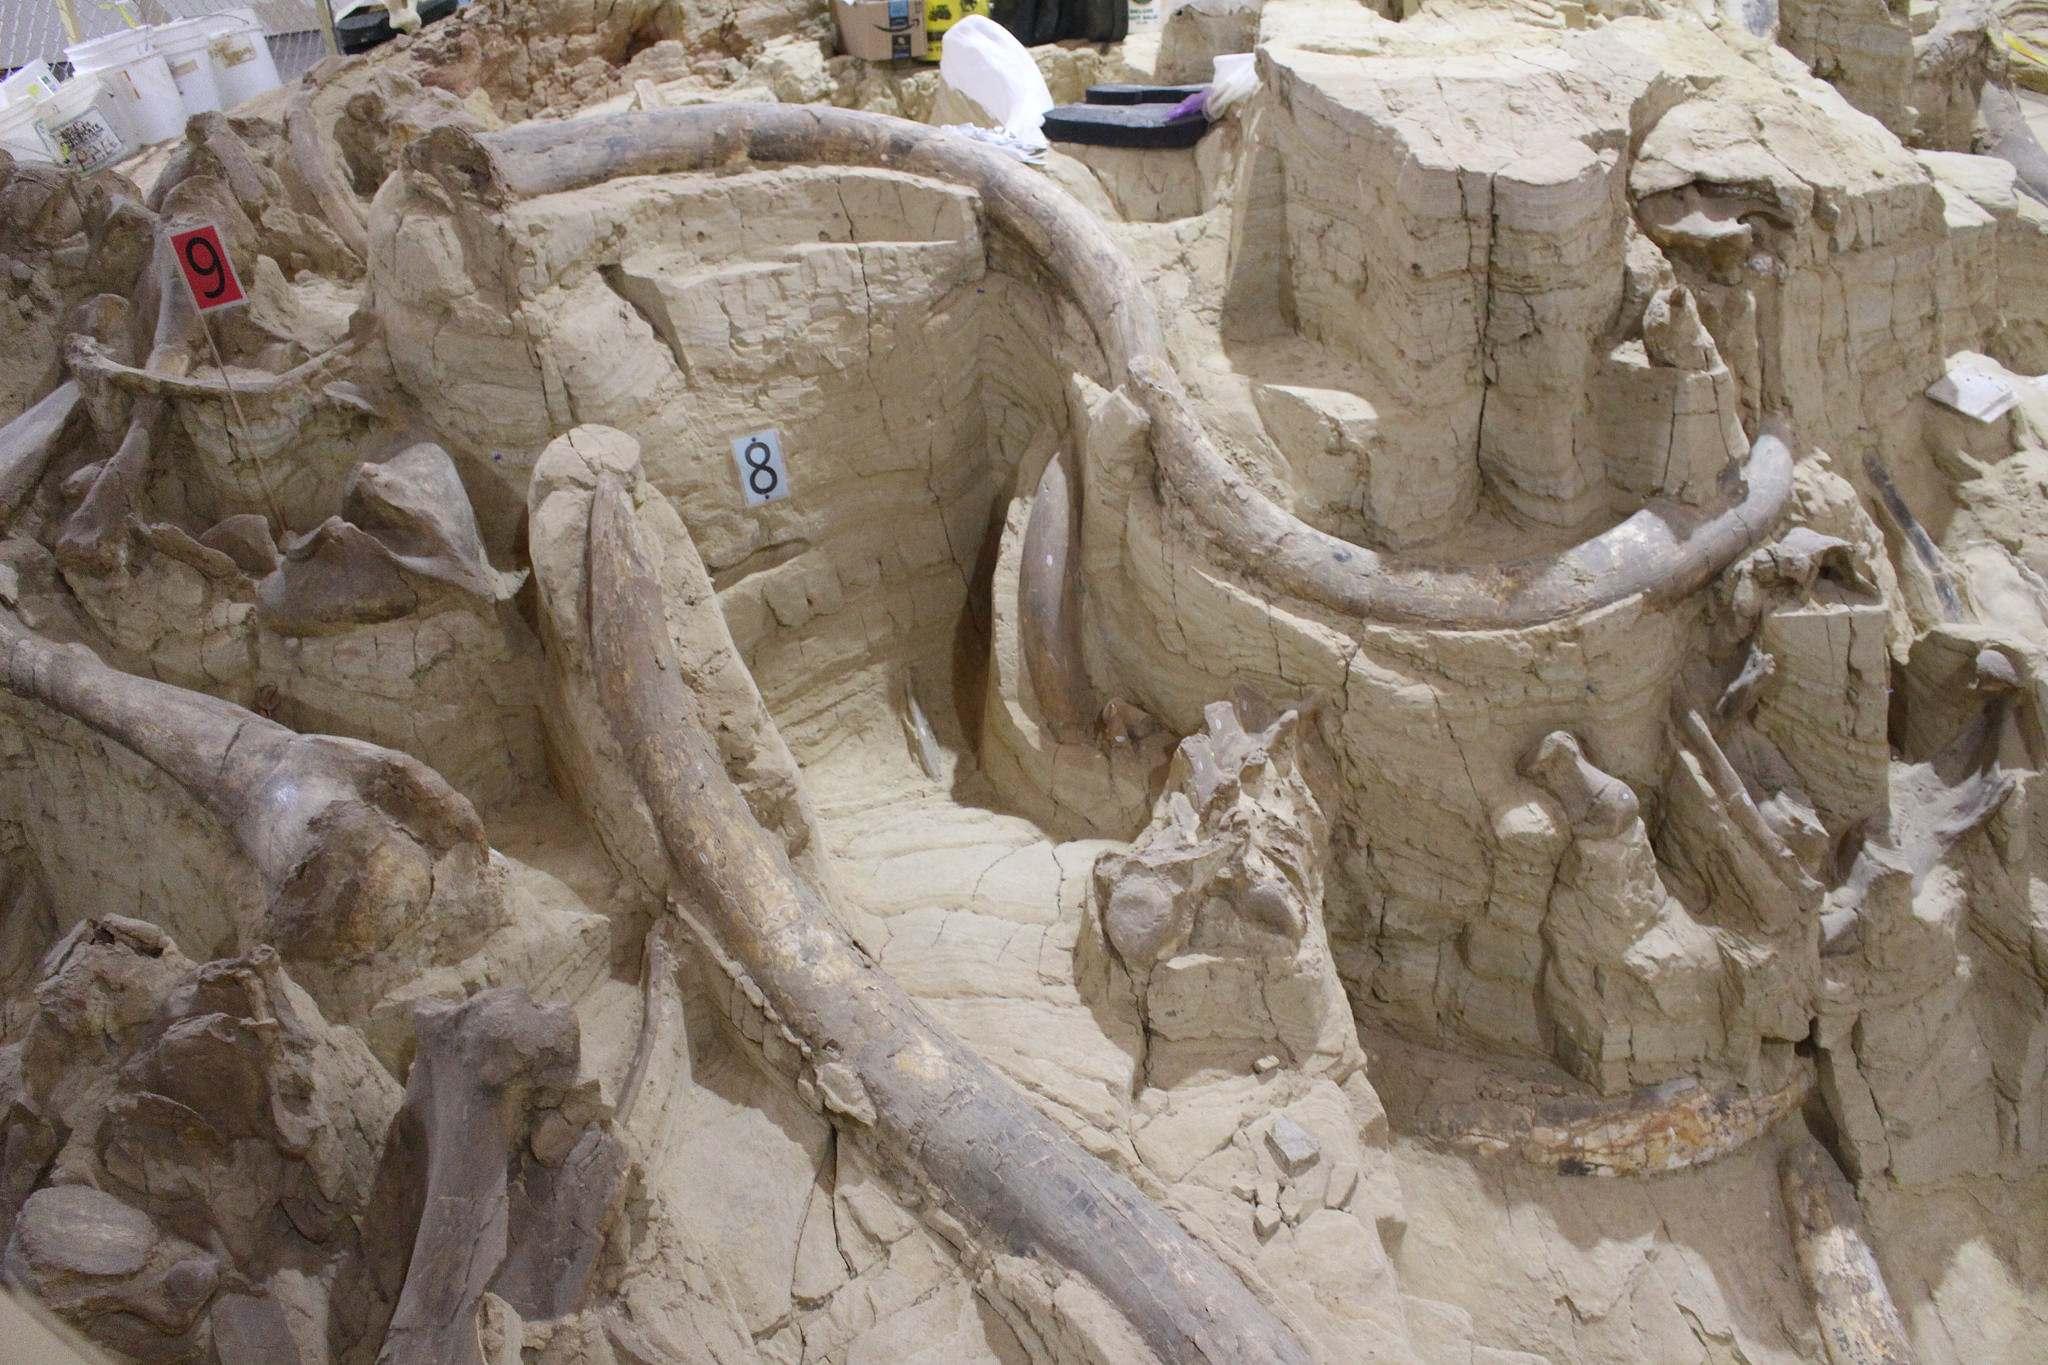 mammoth site10 Mammoth Site of Hot Springs in South Dakota